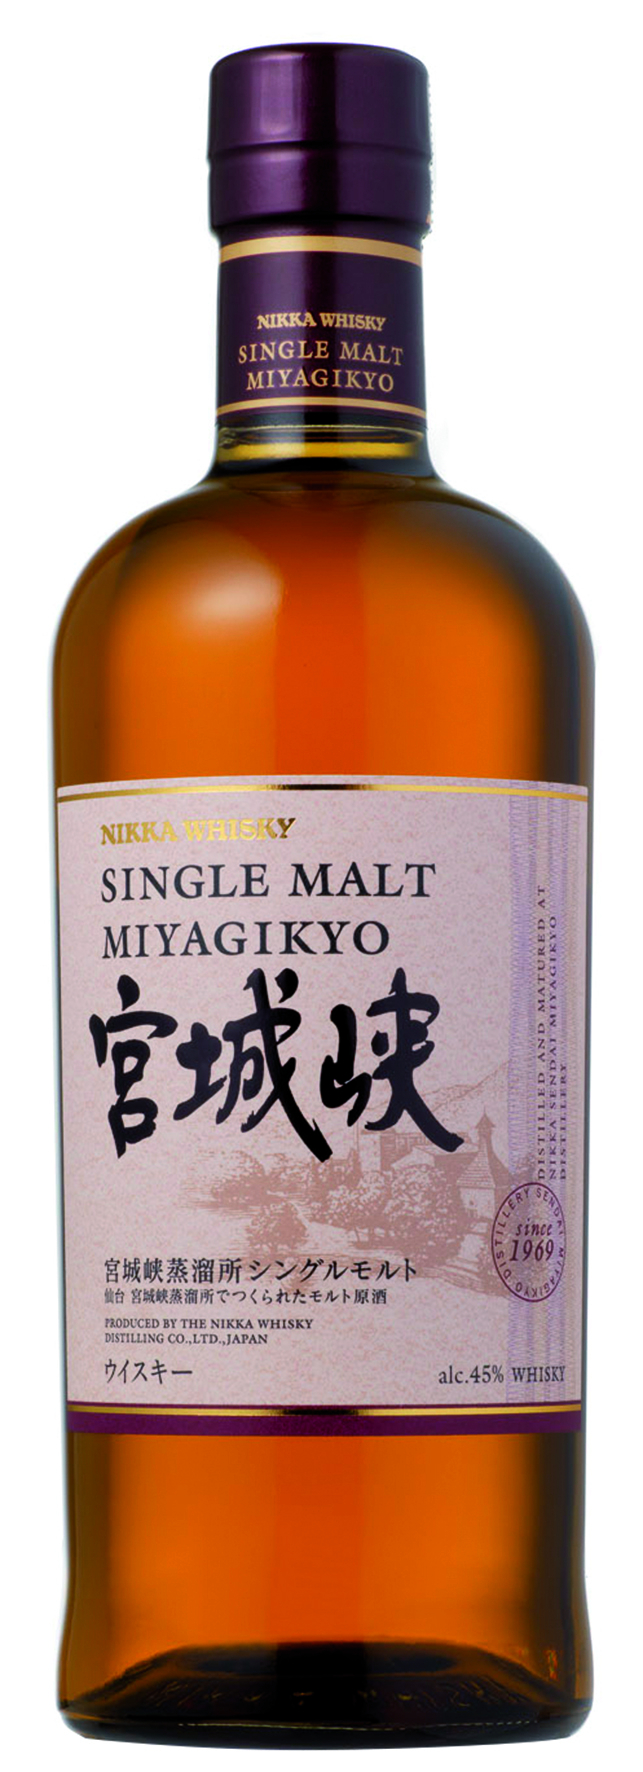 Nikka Miyagikyo Whisky